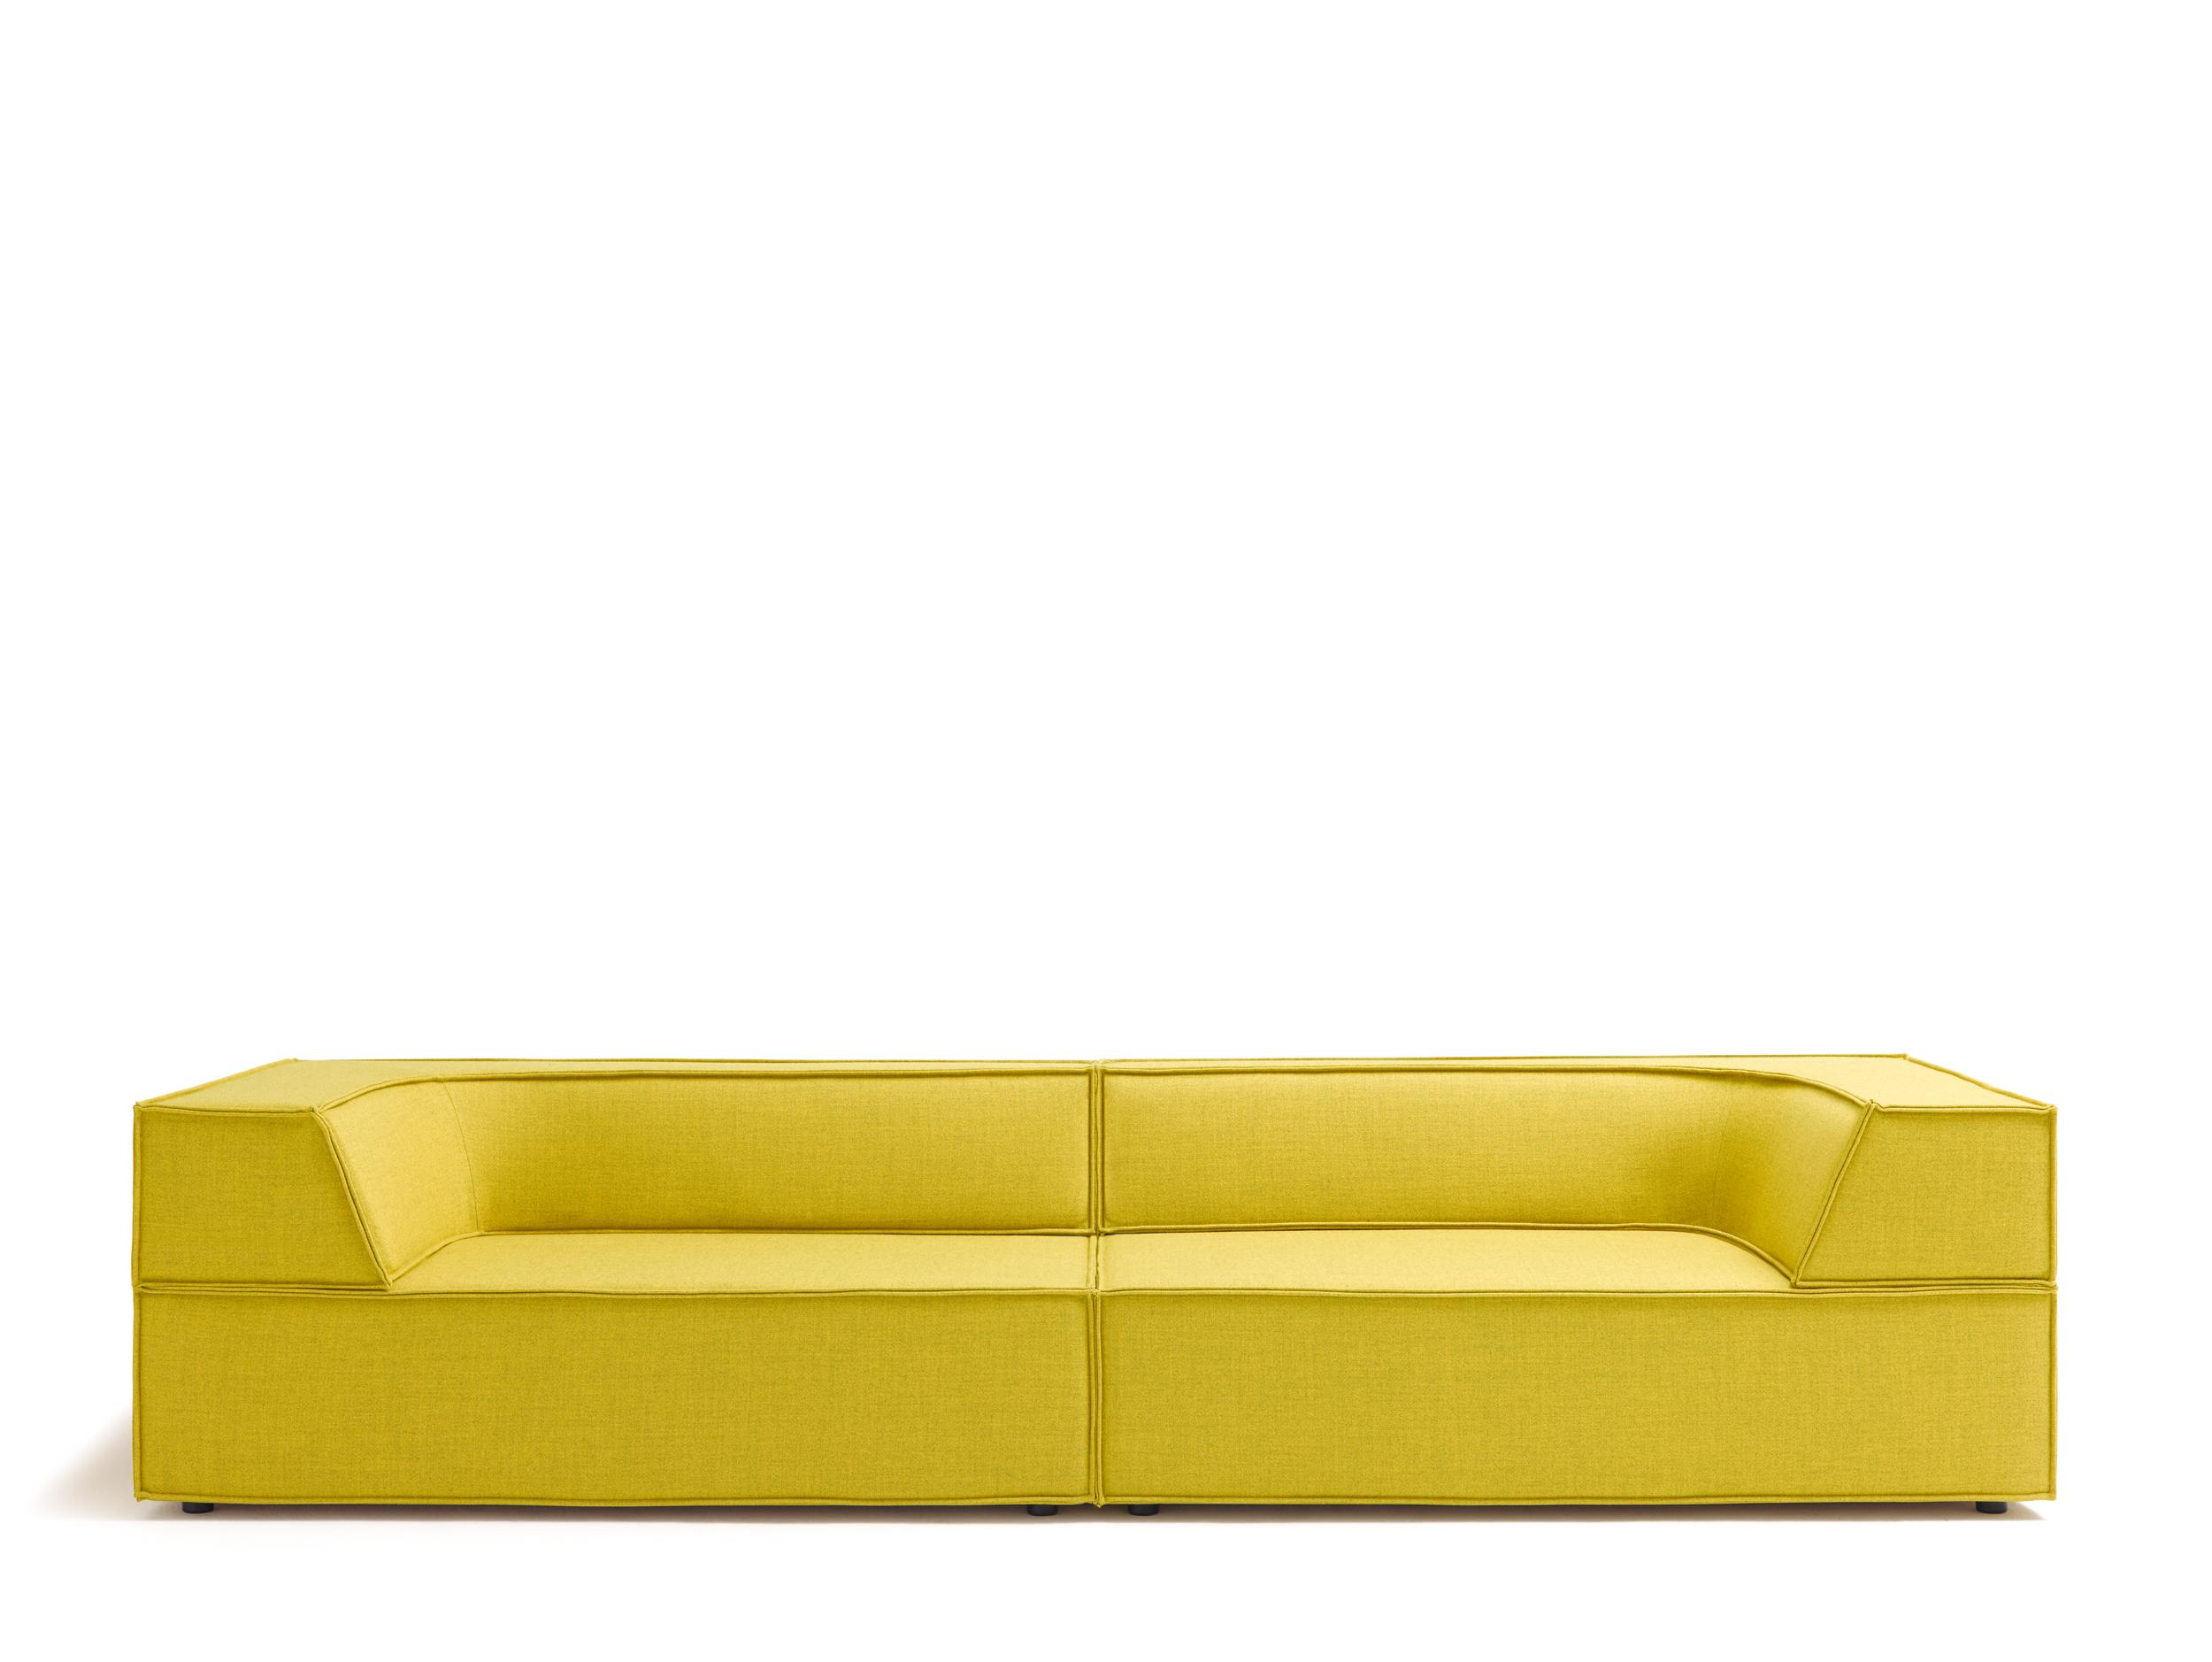 trio sofa professional cor. Black Bedroom Furniture Sets. Home Design Ideas